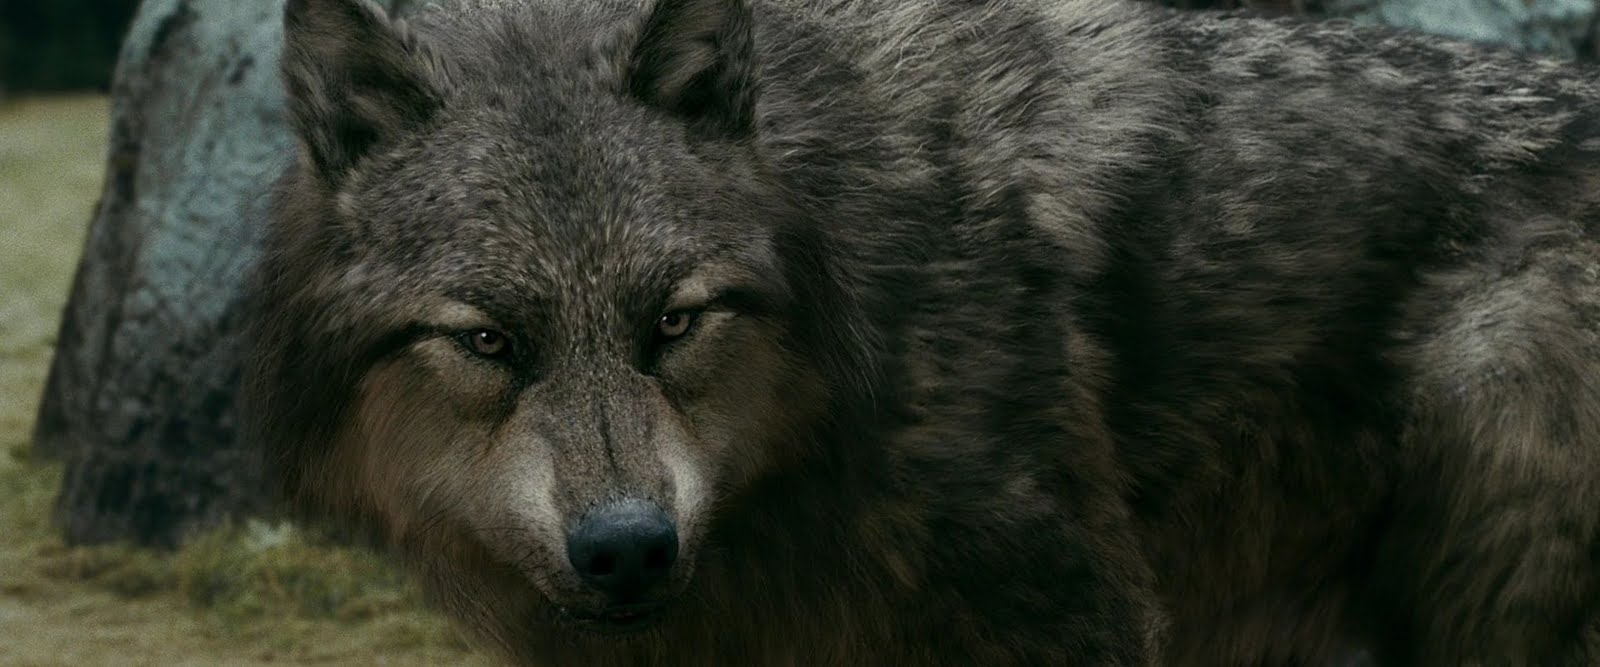 jacob black werewolf transformation - photo #38